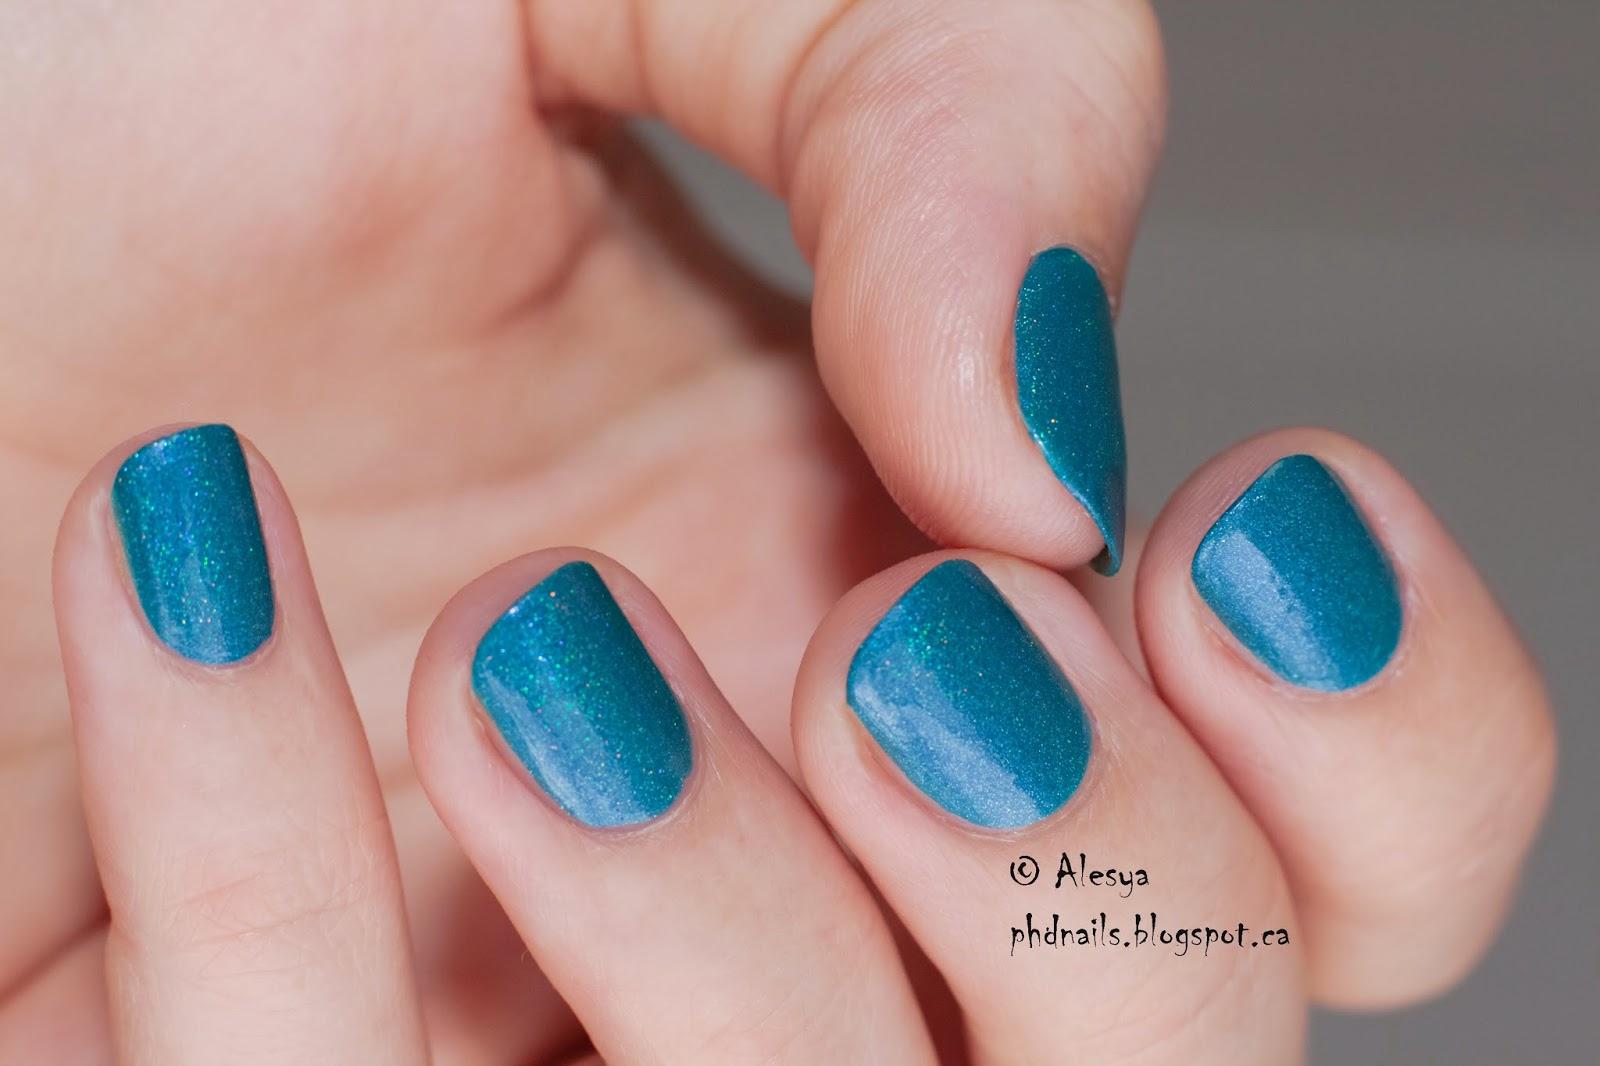 PhD nails: ABC challenge: Enchanted polish LaLa land swatch